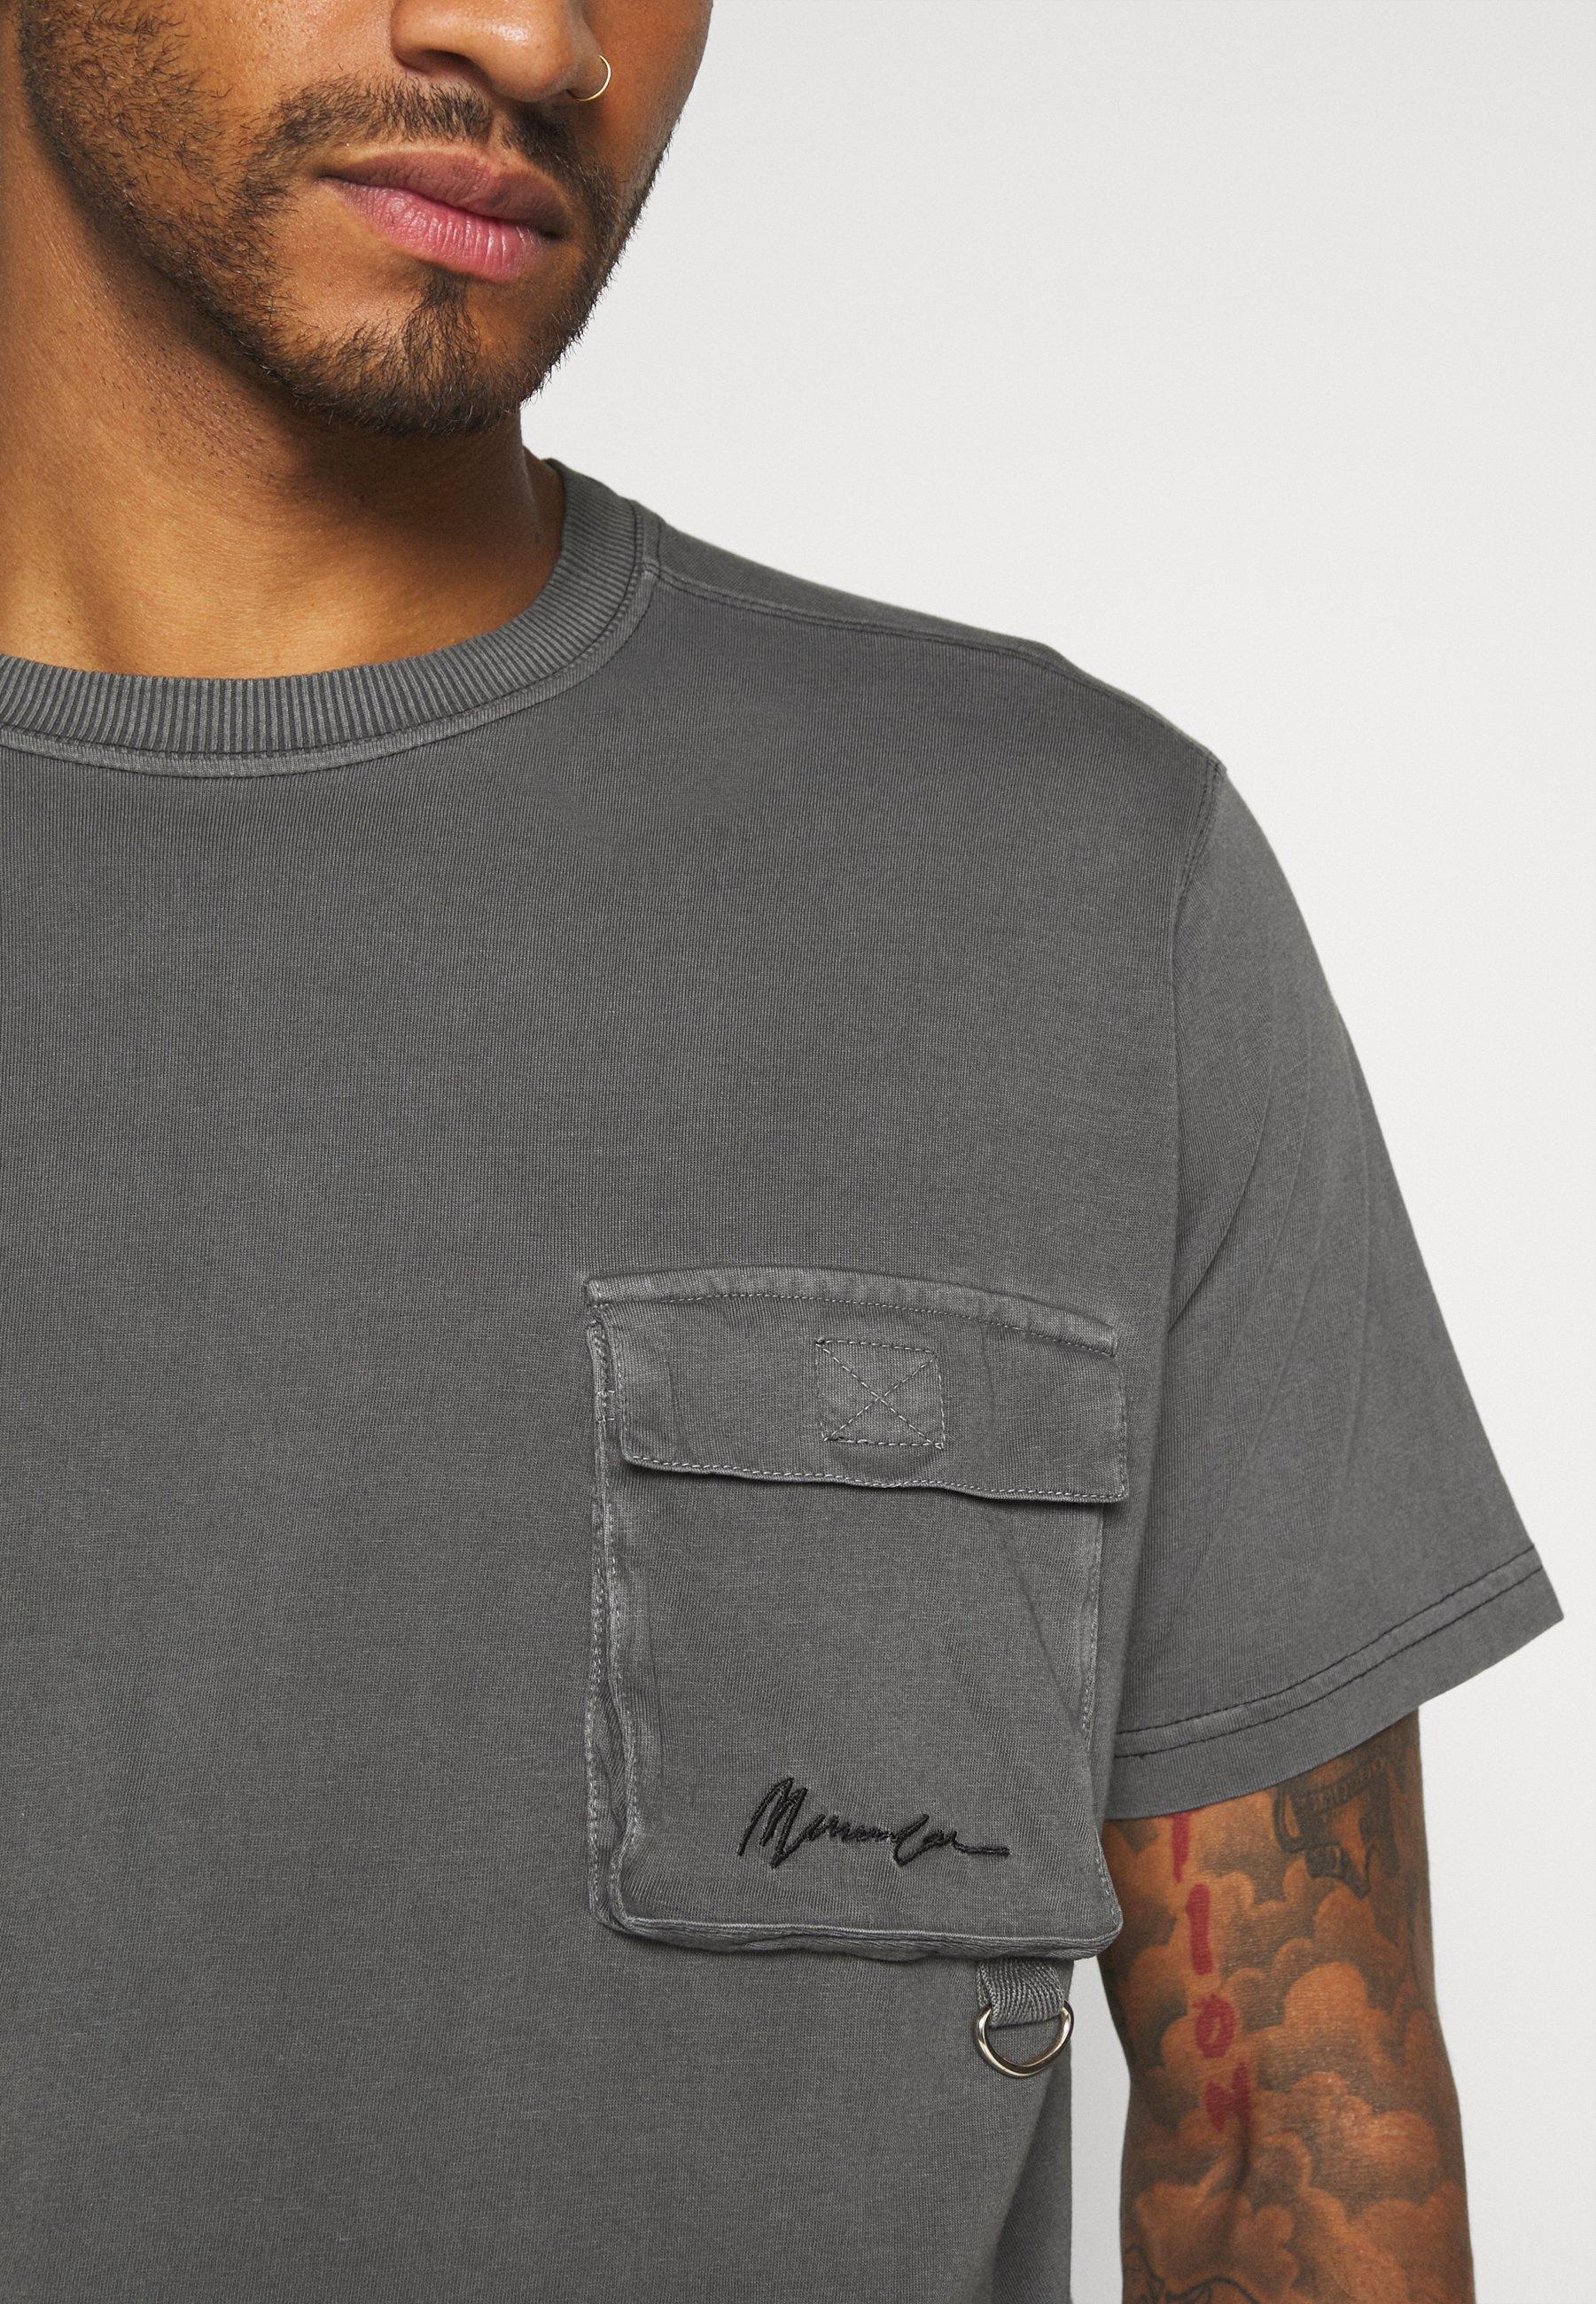 Mennace UTLITY POCKET OVERLOCK - Basic T-shirt - black 9bL2a